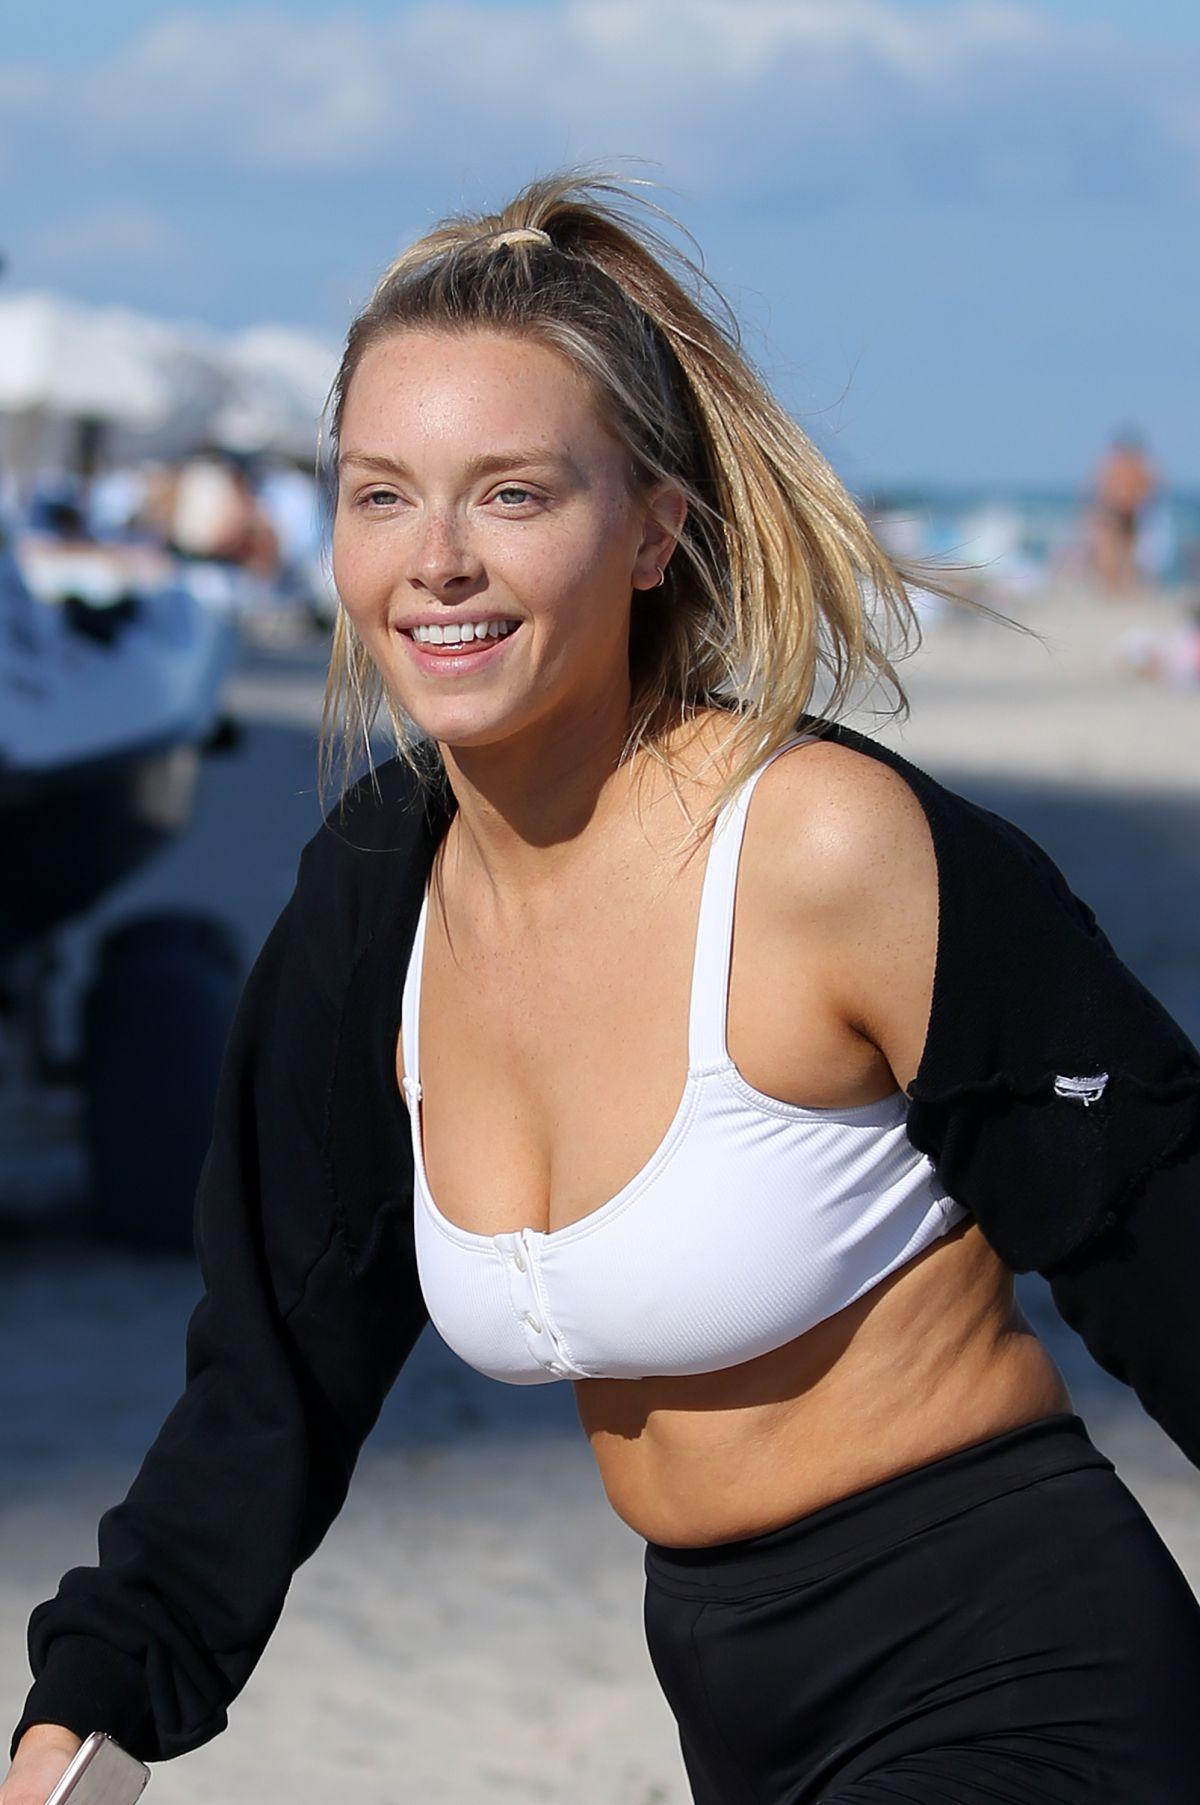 Hot Vanessa Kirby nude (66 photos), Tits, Bikini, Boobs, bra 2017